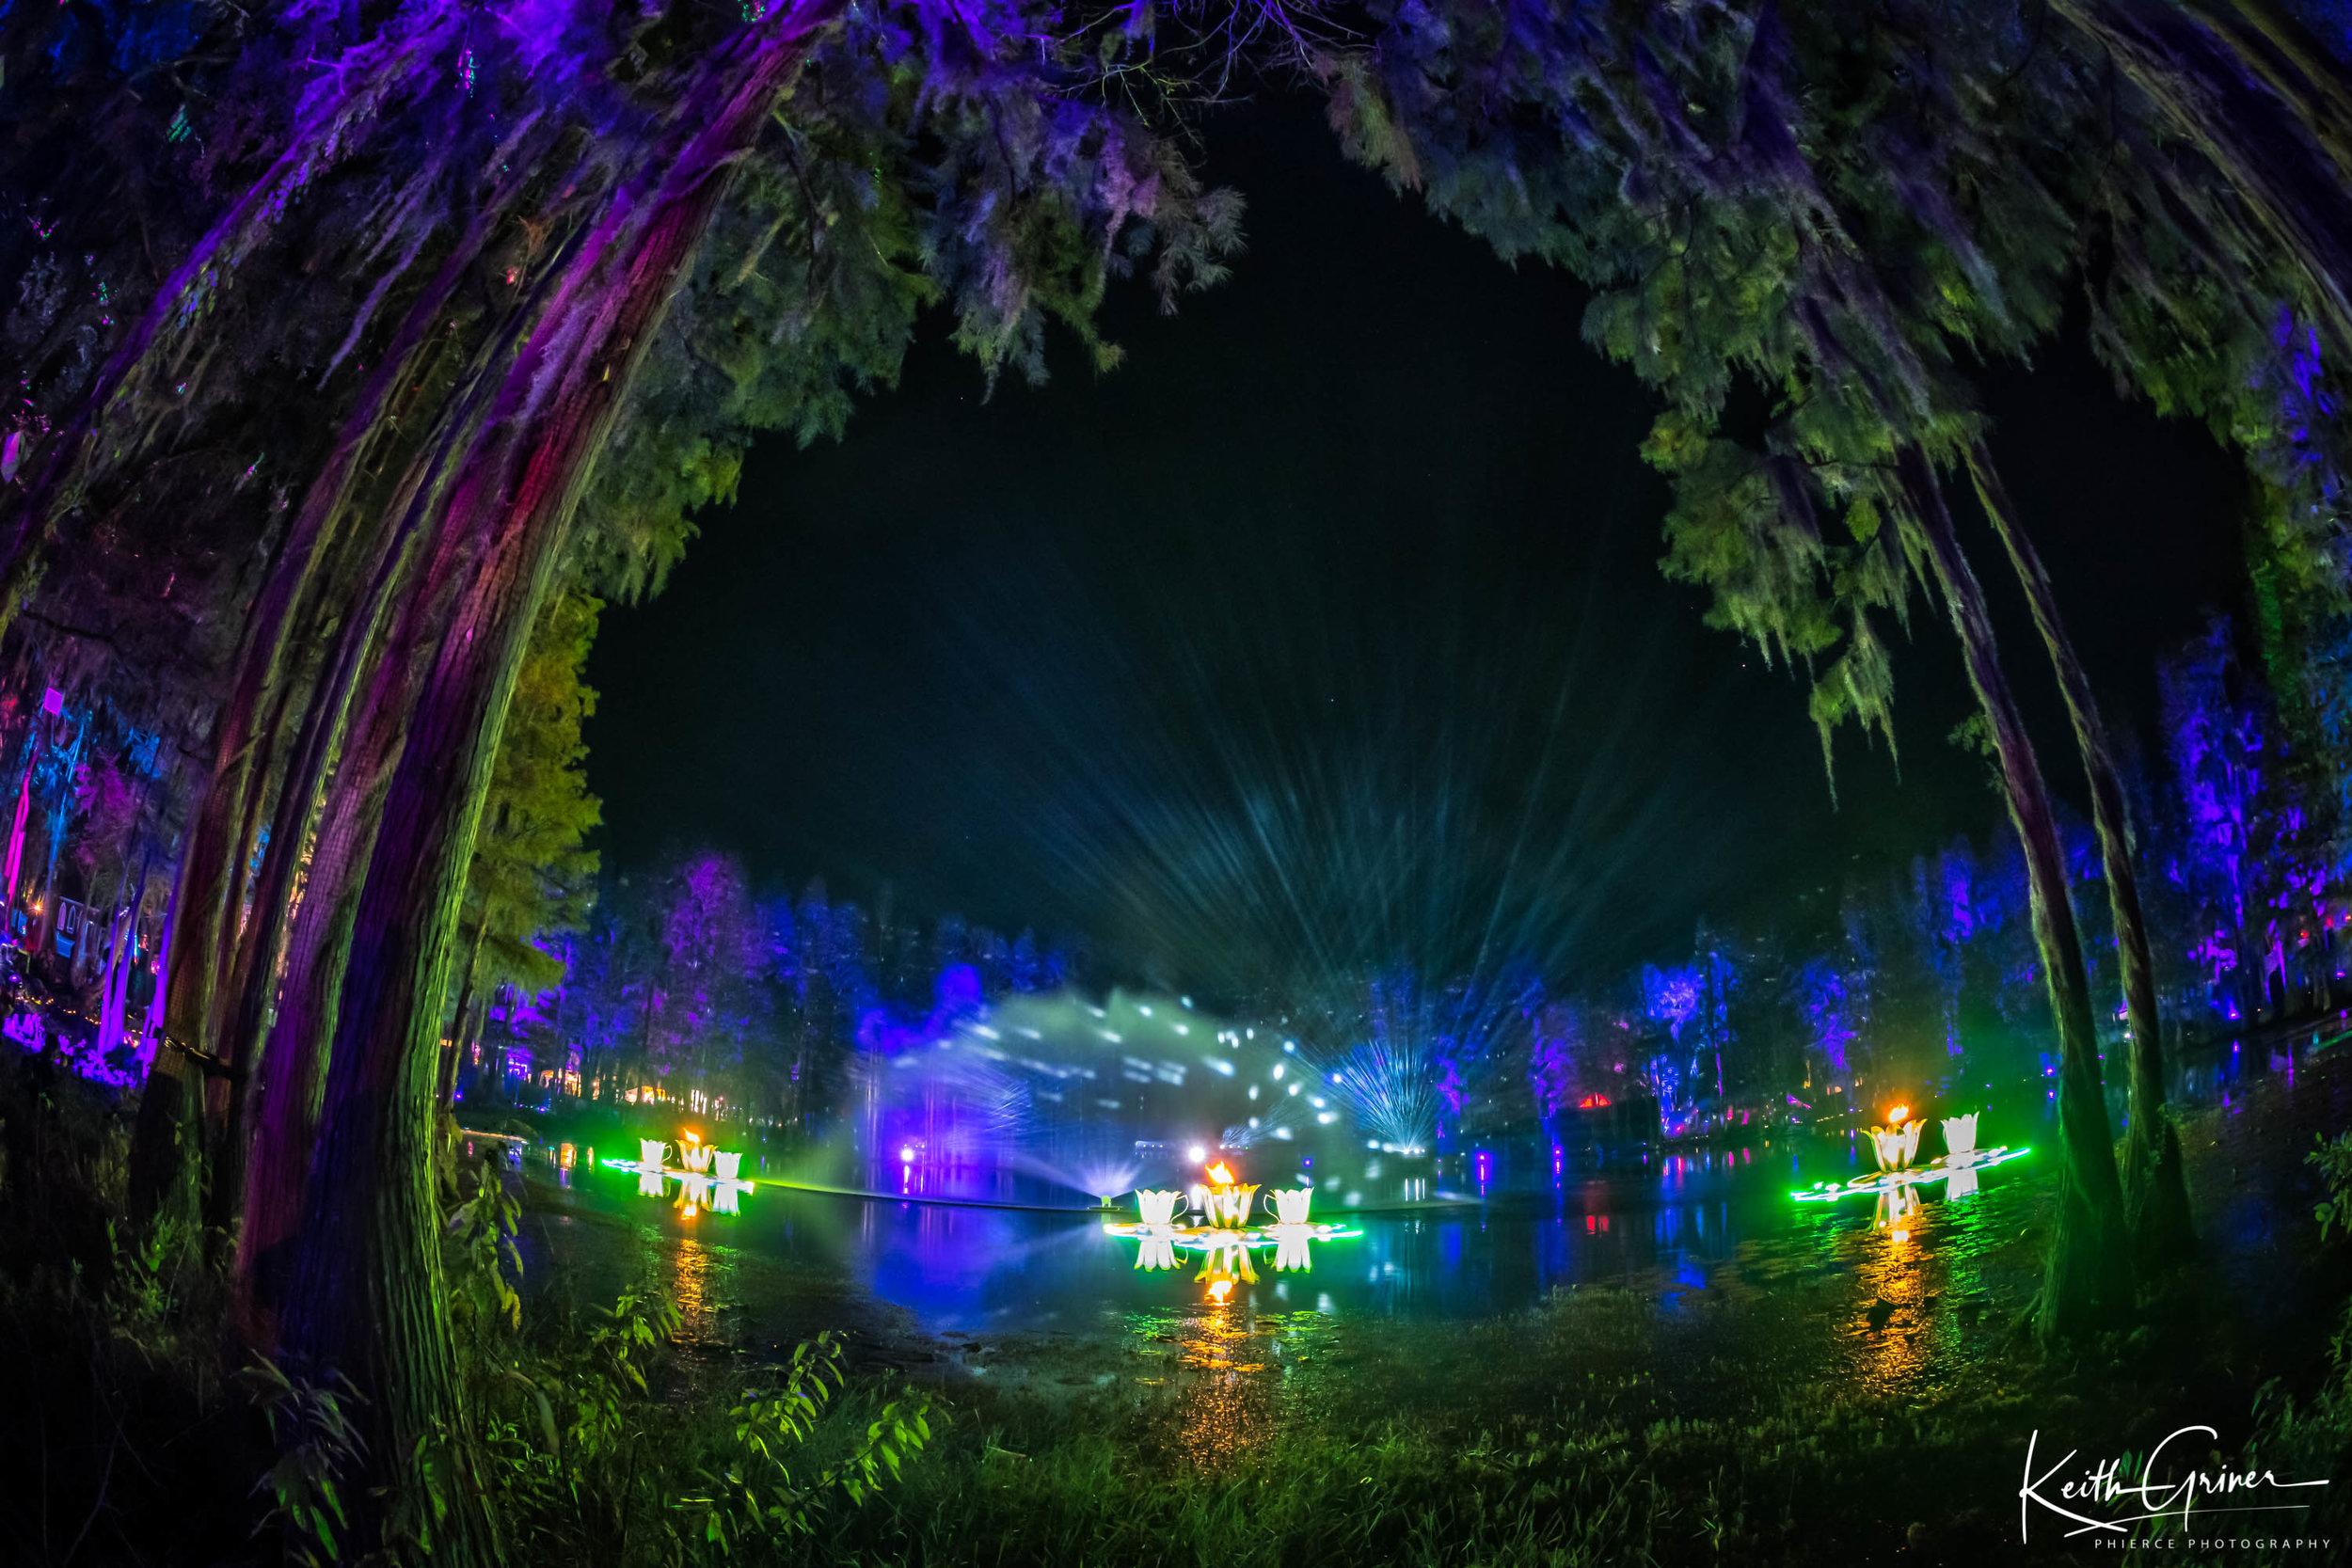 Hula_Spirit Lake_by Keith Griner 0D5_3218-Edit.jpg